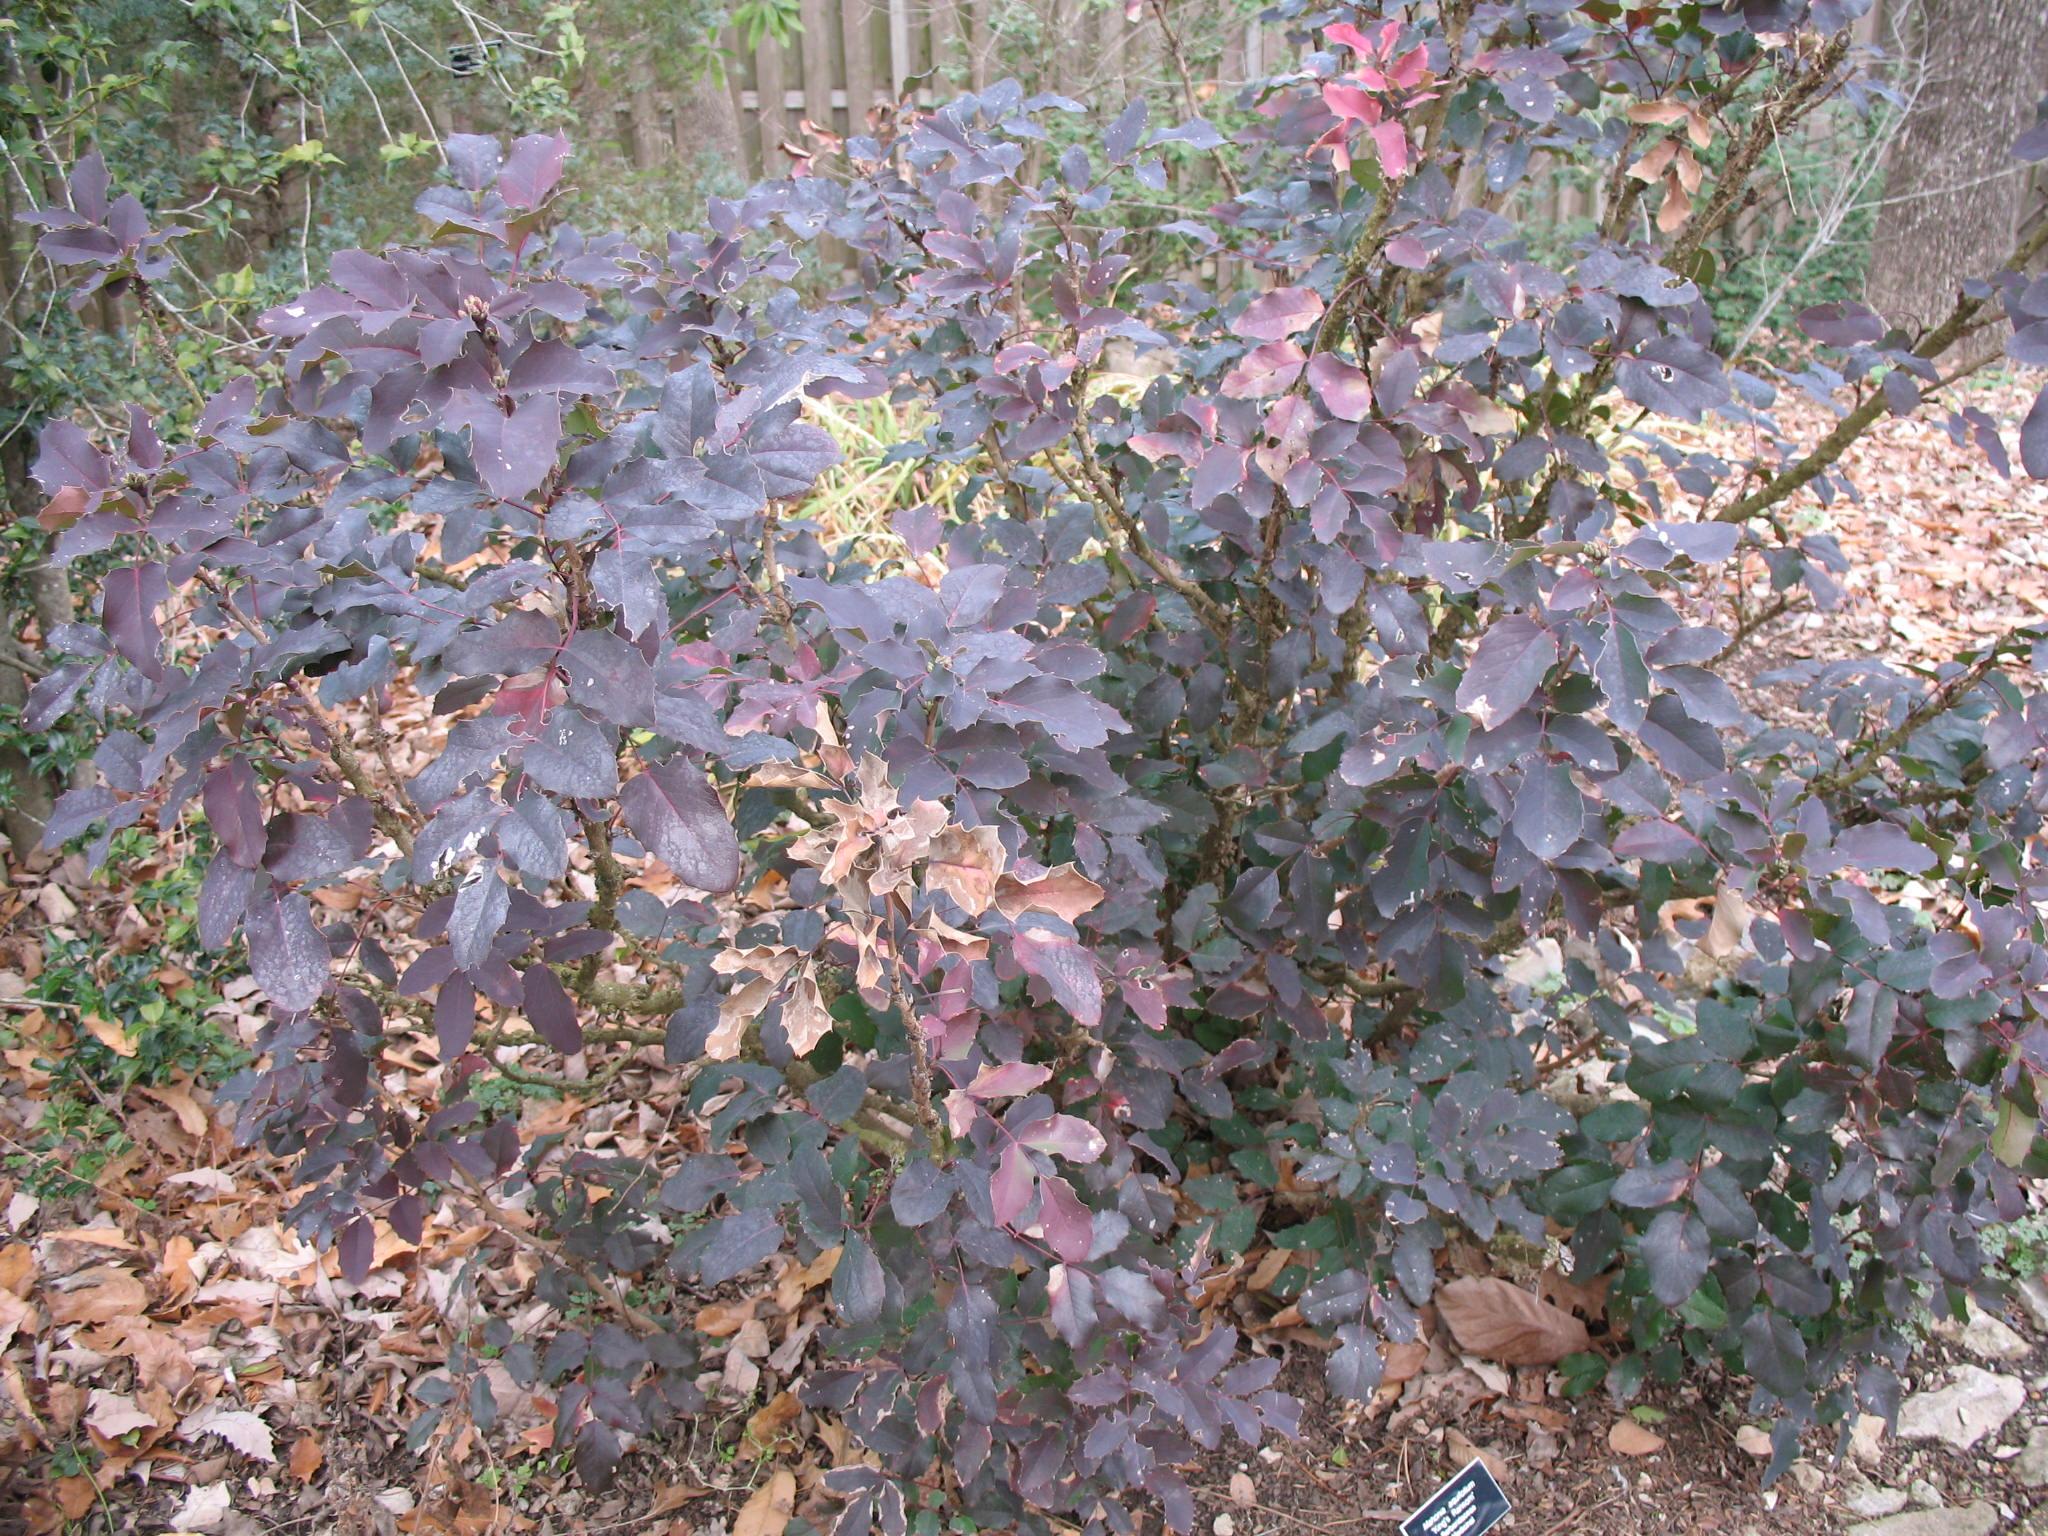 Mahonia aquifolium 'King's Ransom' / Mahonia aquifolium 'King's Ransom'